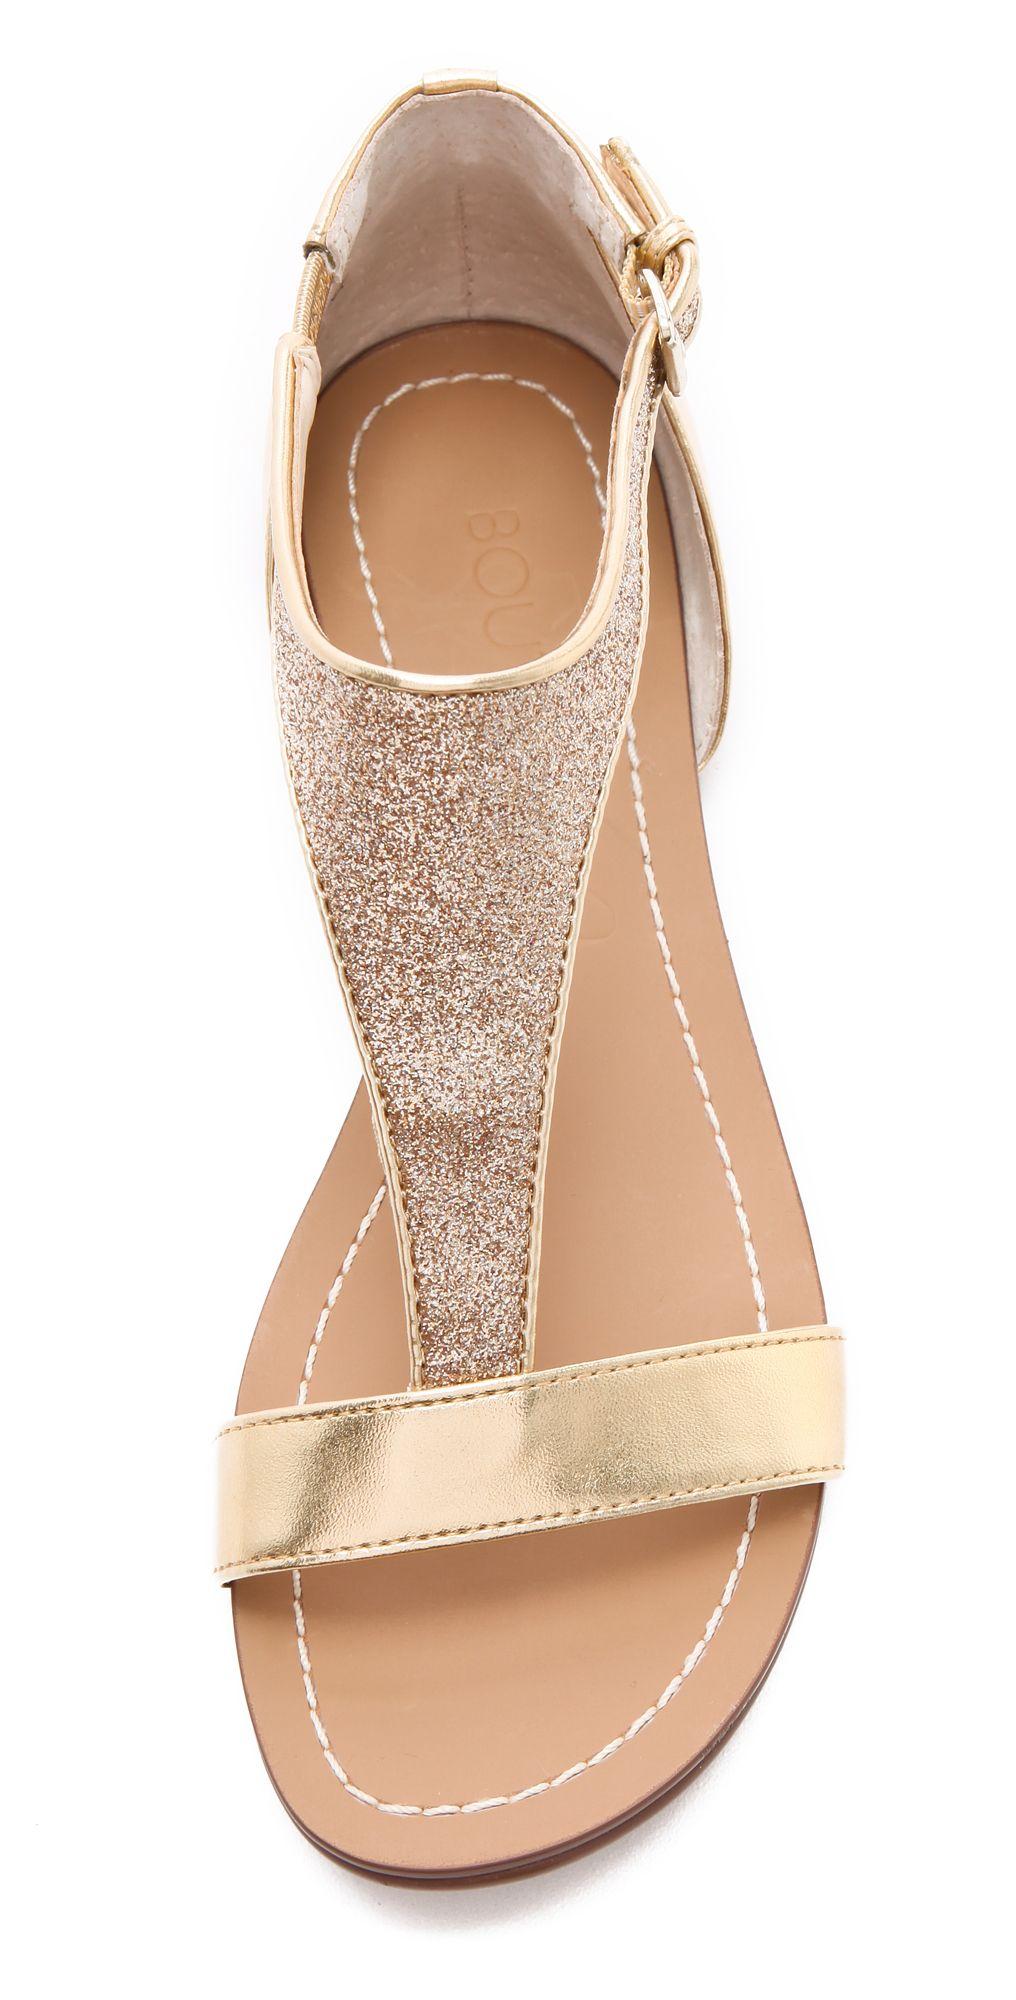 Boutique 9 Piraya Glitter Sandals   SHOPBOP